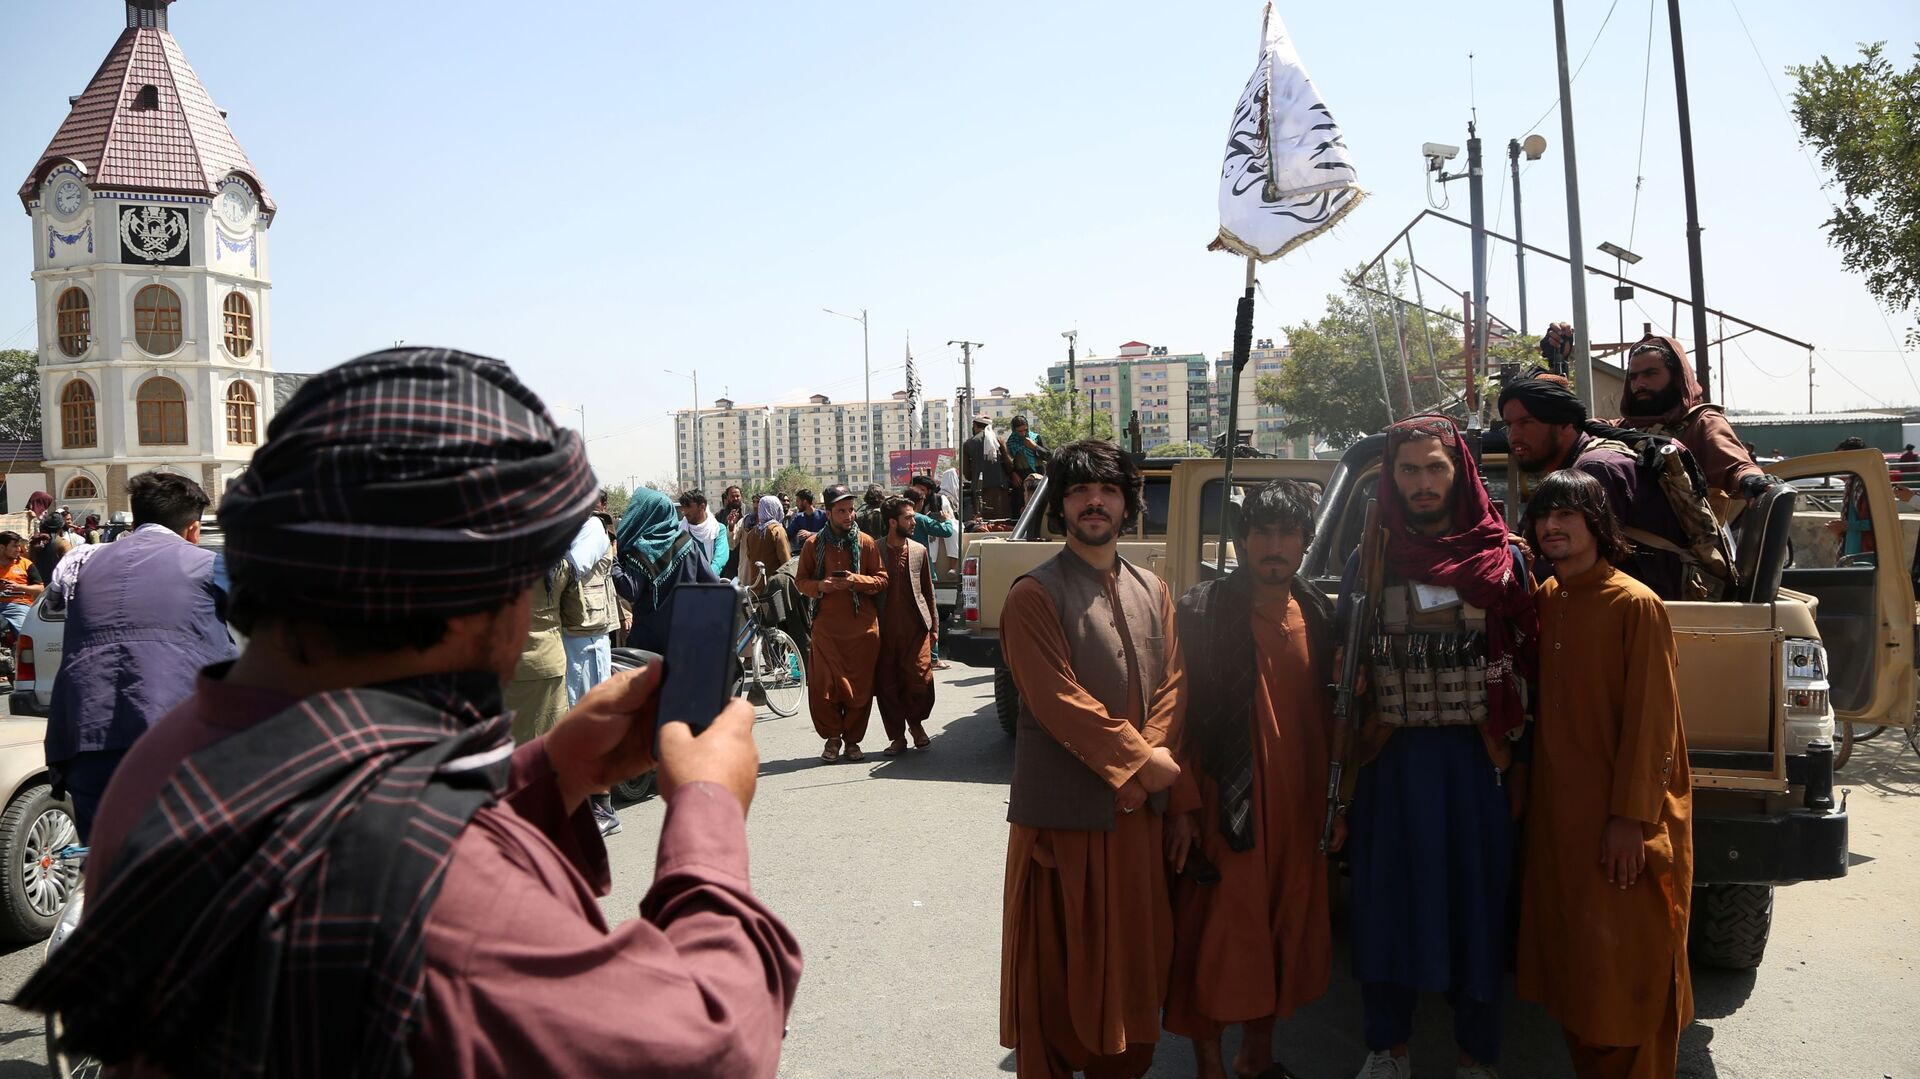 Taliban-Kämpfer in Kabul, Afghanistan - SNA, 1920, 06.09.2021